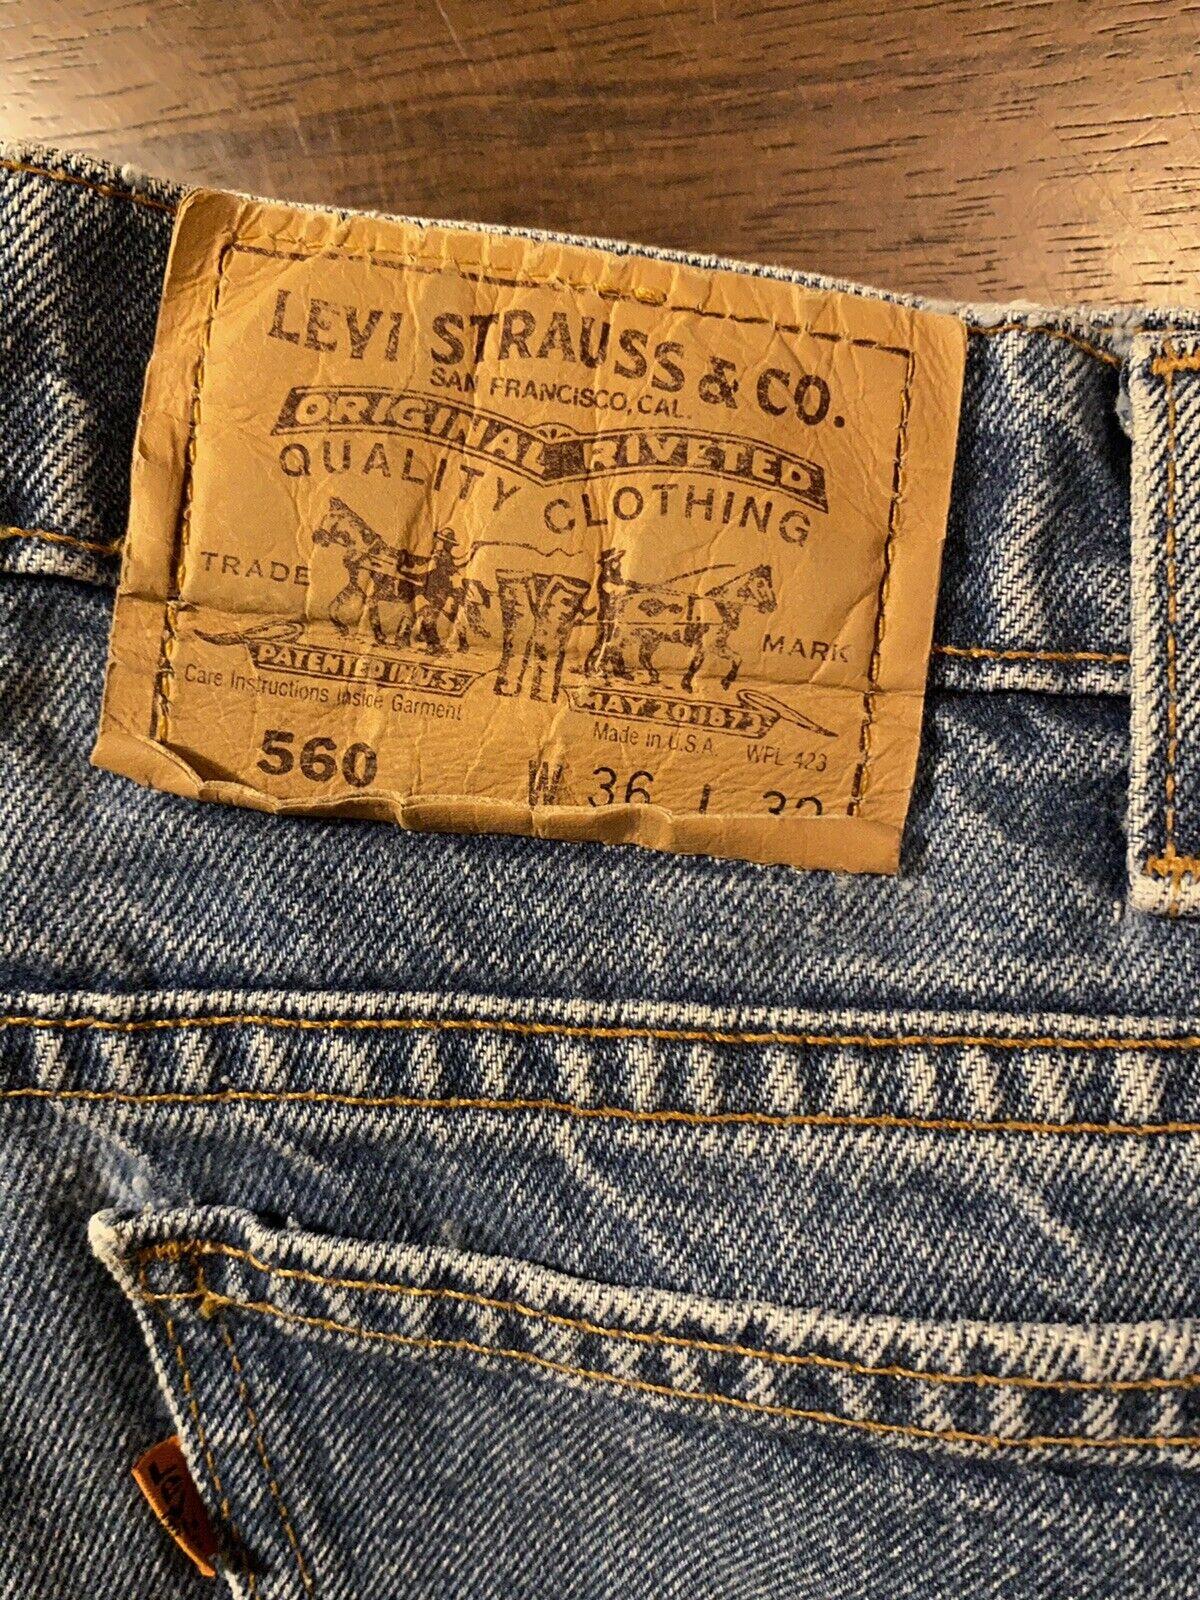 Vintage Levis (Orange Tab) Made In USA - image 2